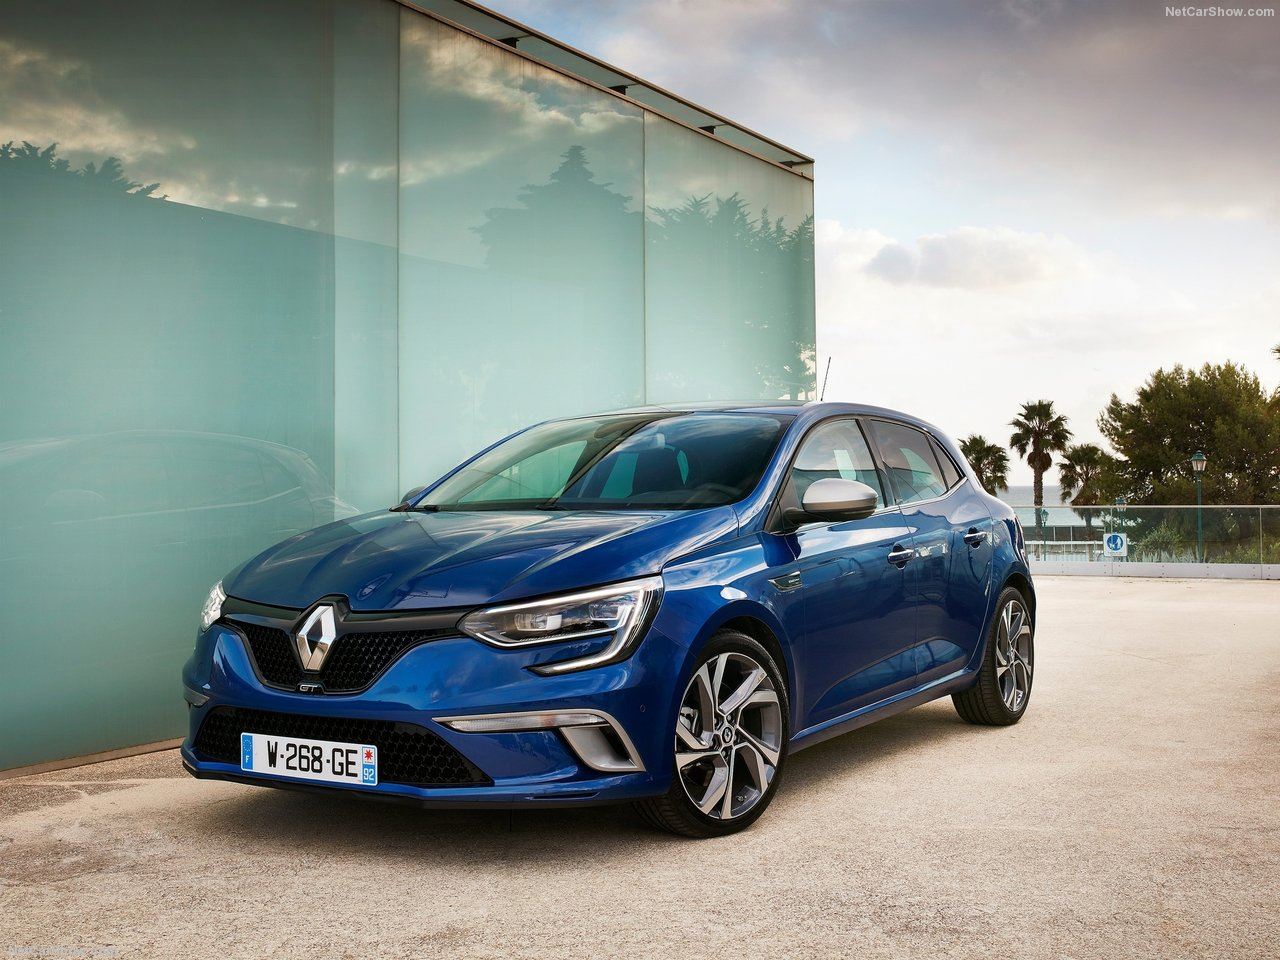 Renault-Megane_2016_1280x960_wallpaper_03